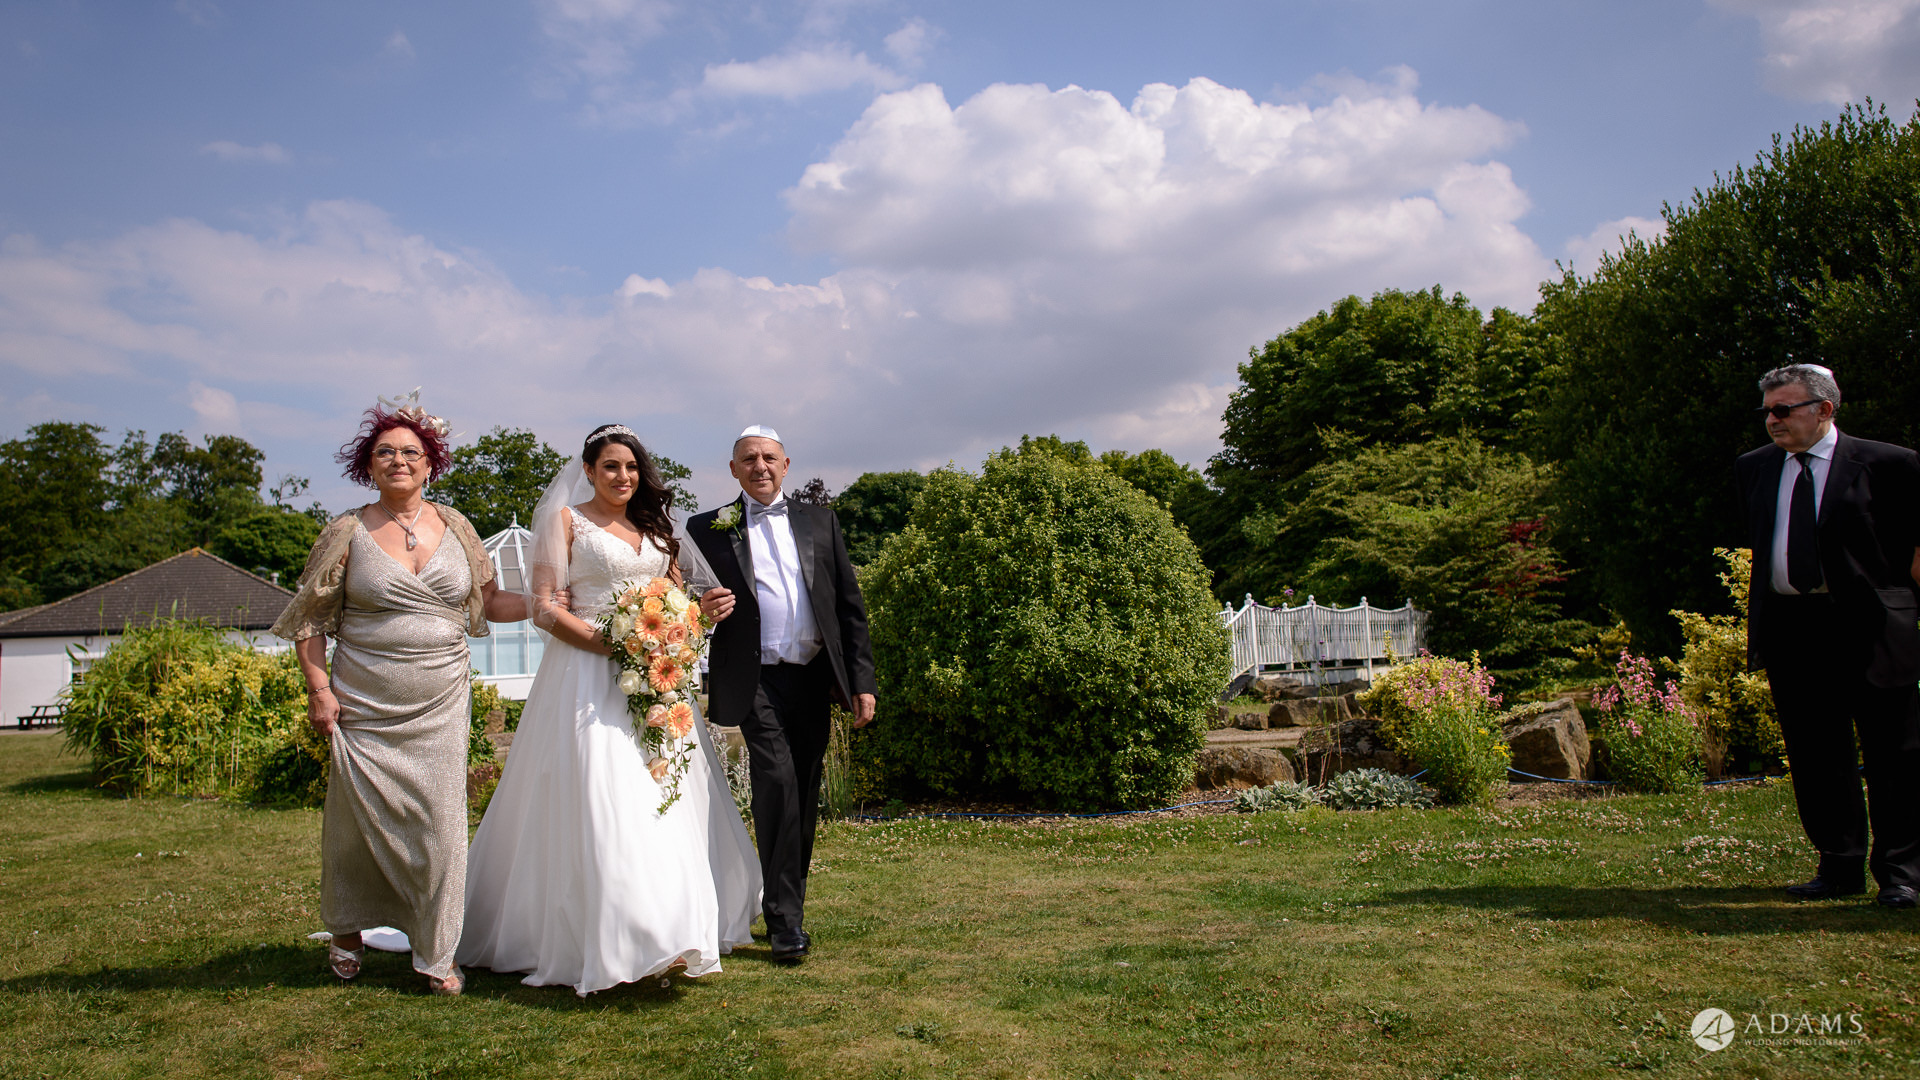 Jewish Wedding at Manor of Groves Wedding Photography   Candice + Doron 75